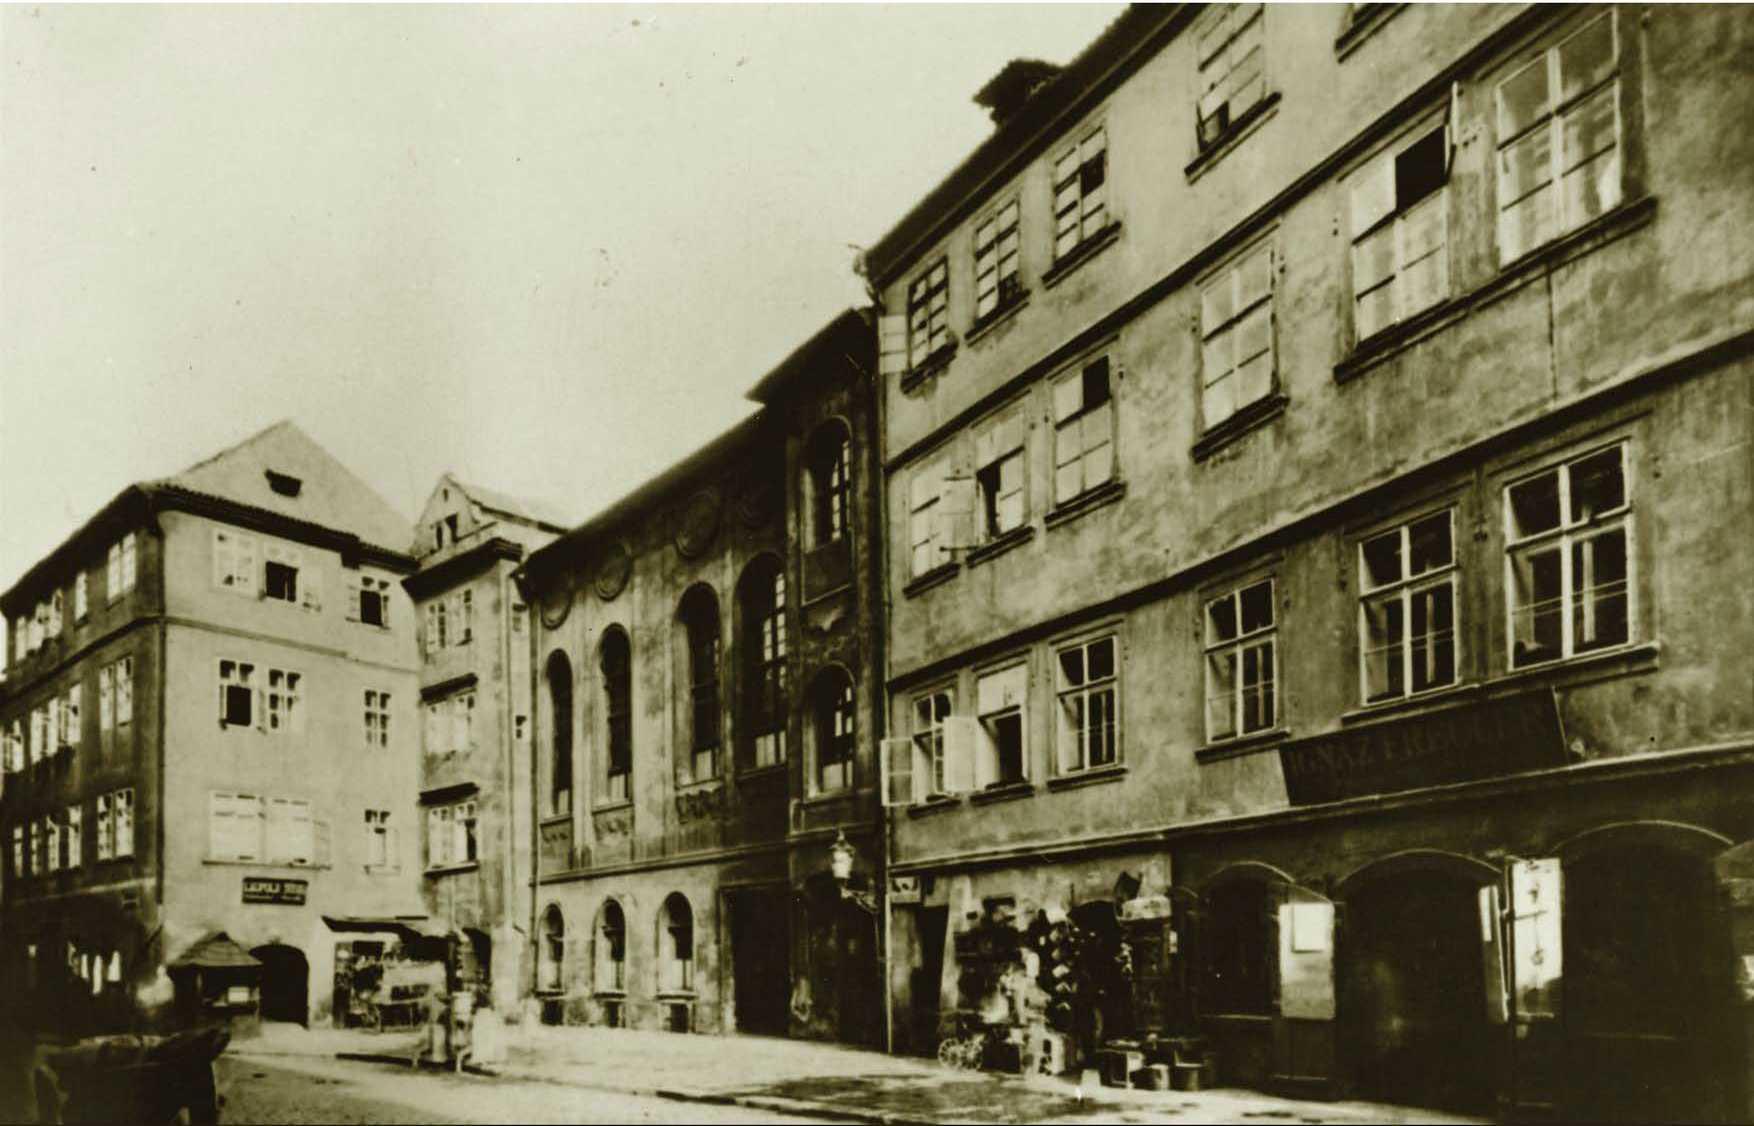 North façade of the New Synagogue